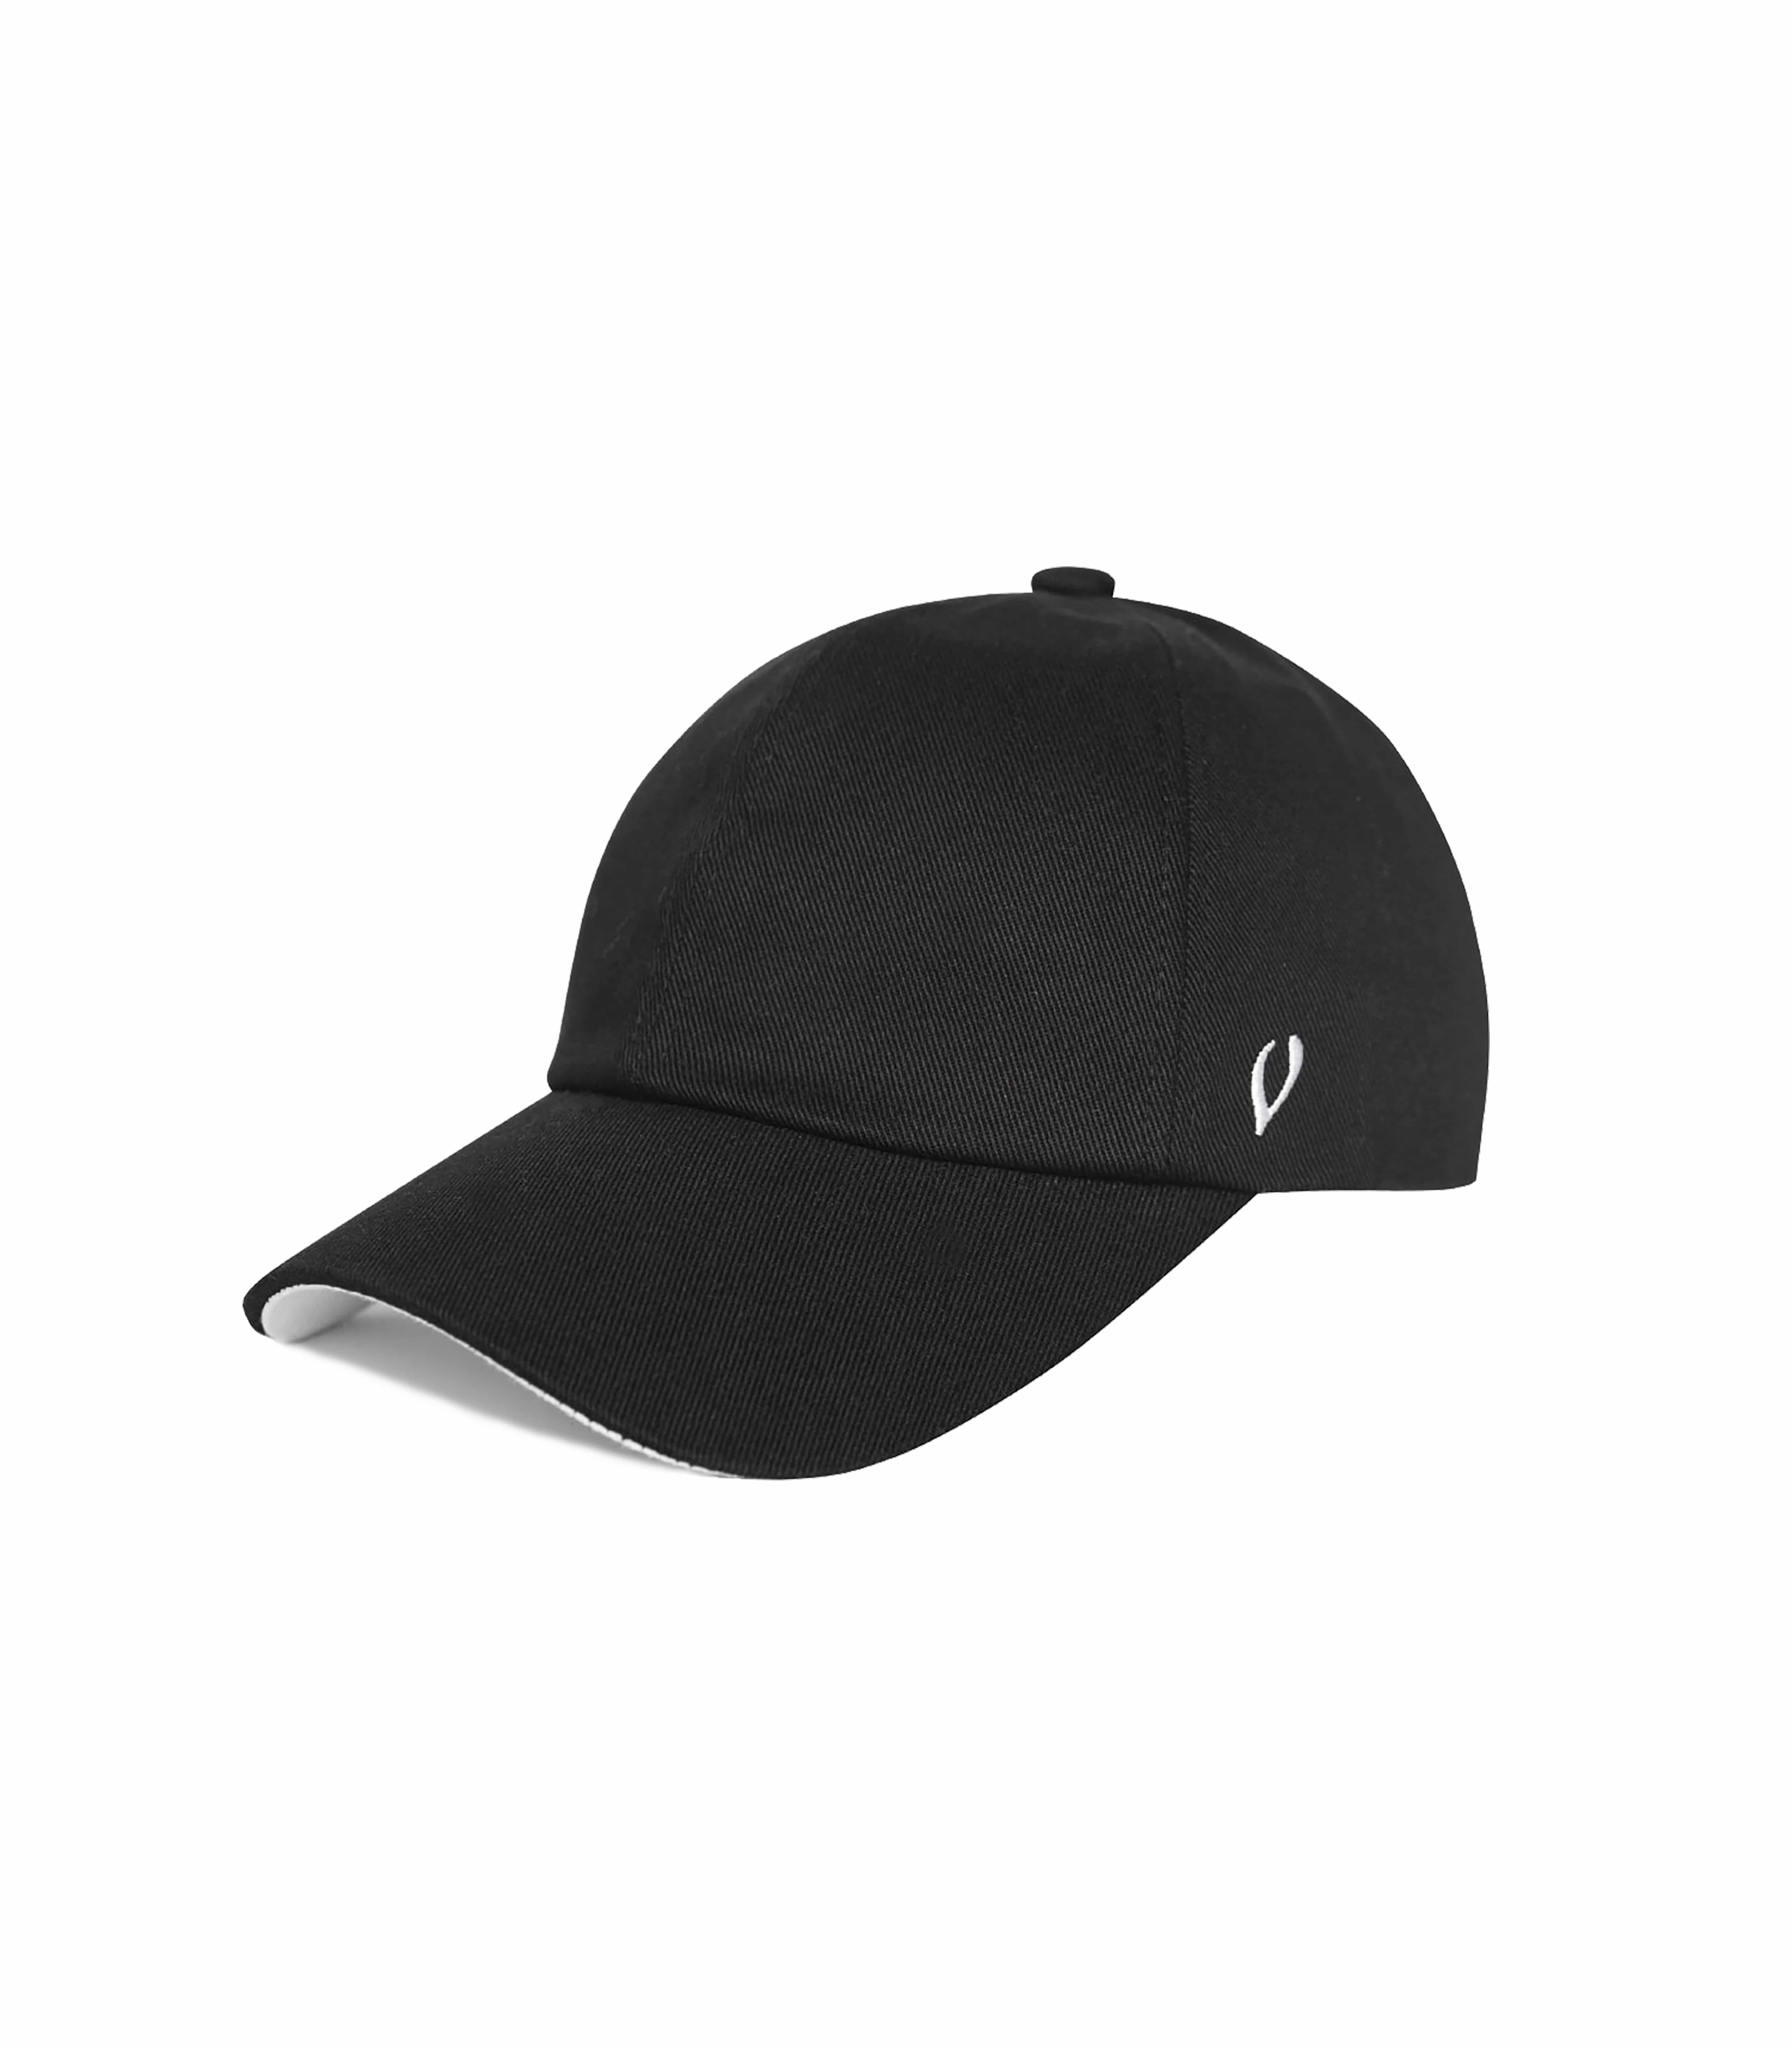 VIBRATEKIDS - DOUBLE SIDE BALL CAP (BLACK)